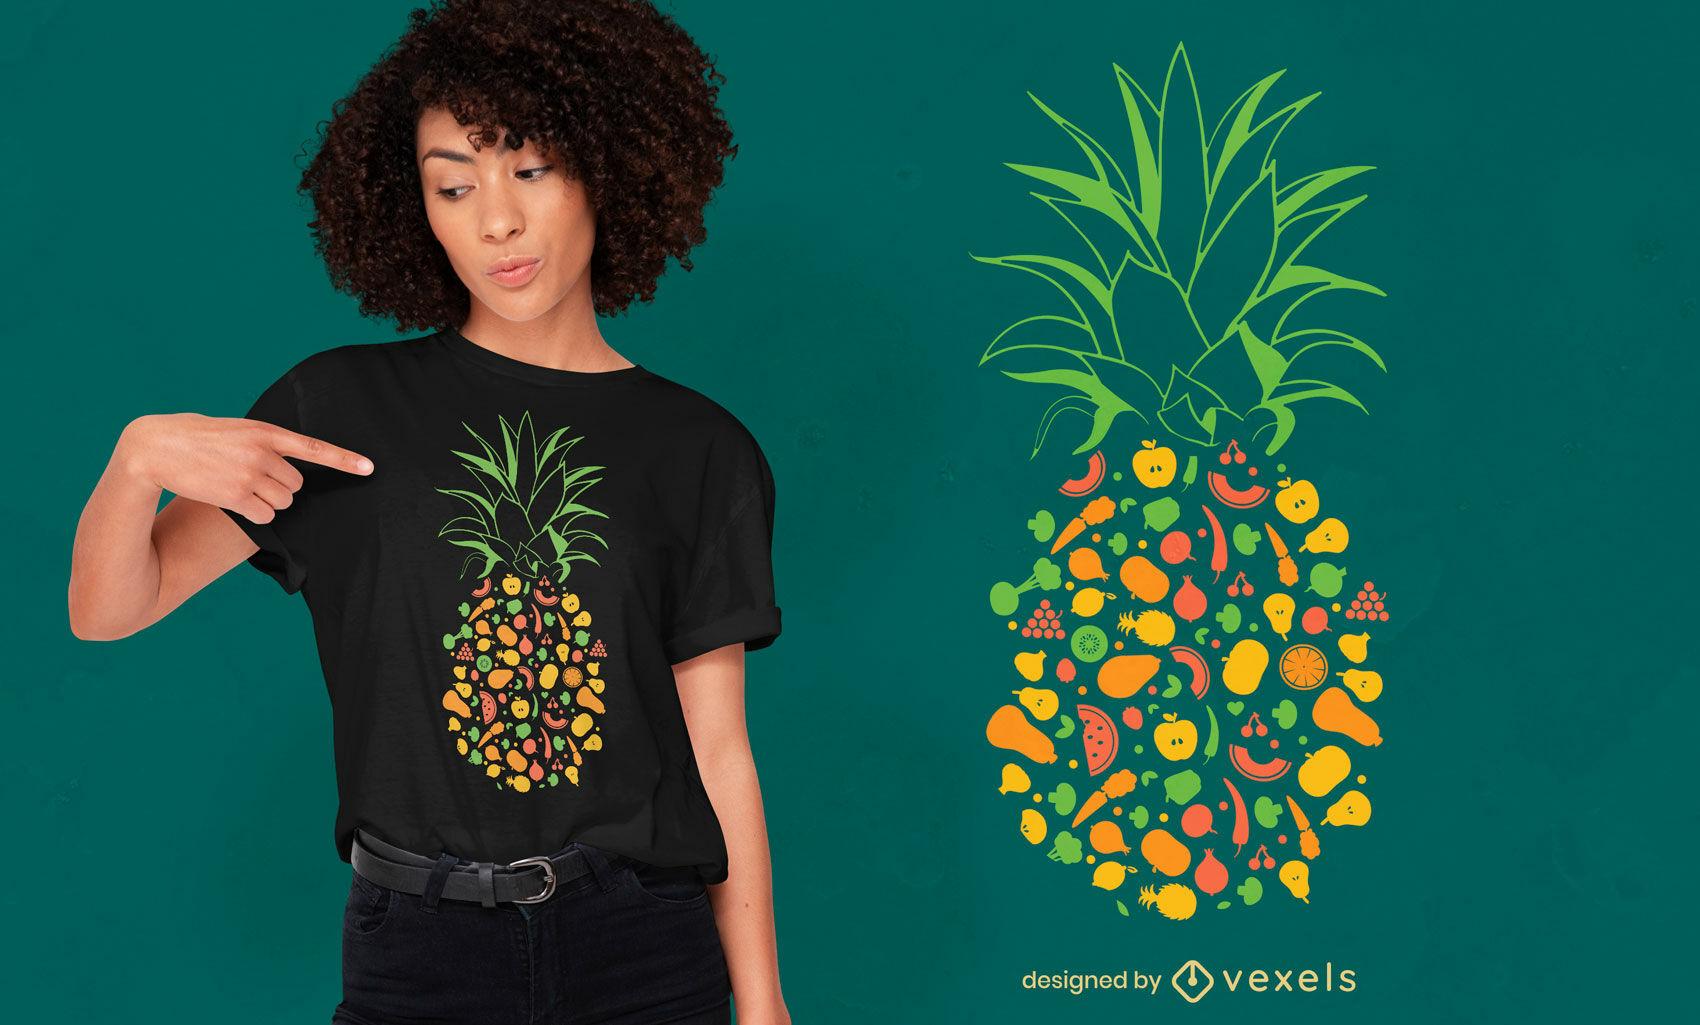 Pineapple made of fruits t-shirt design